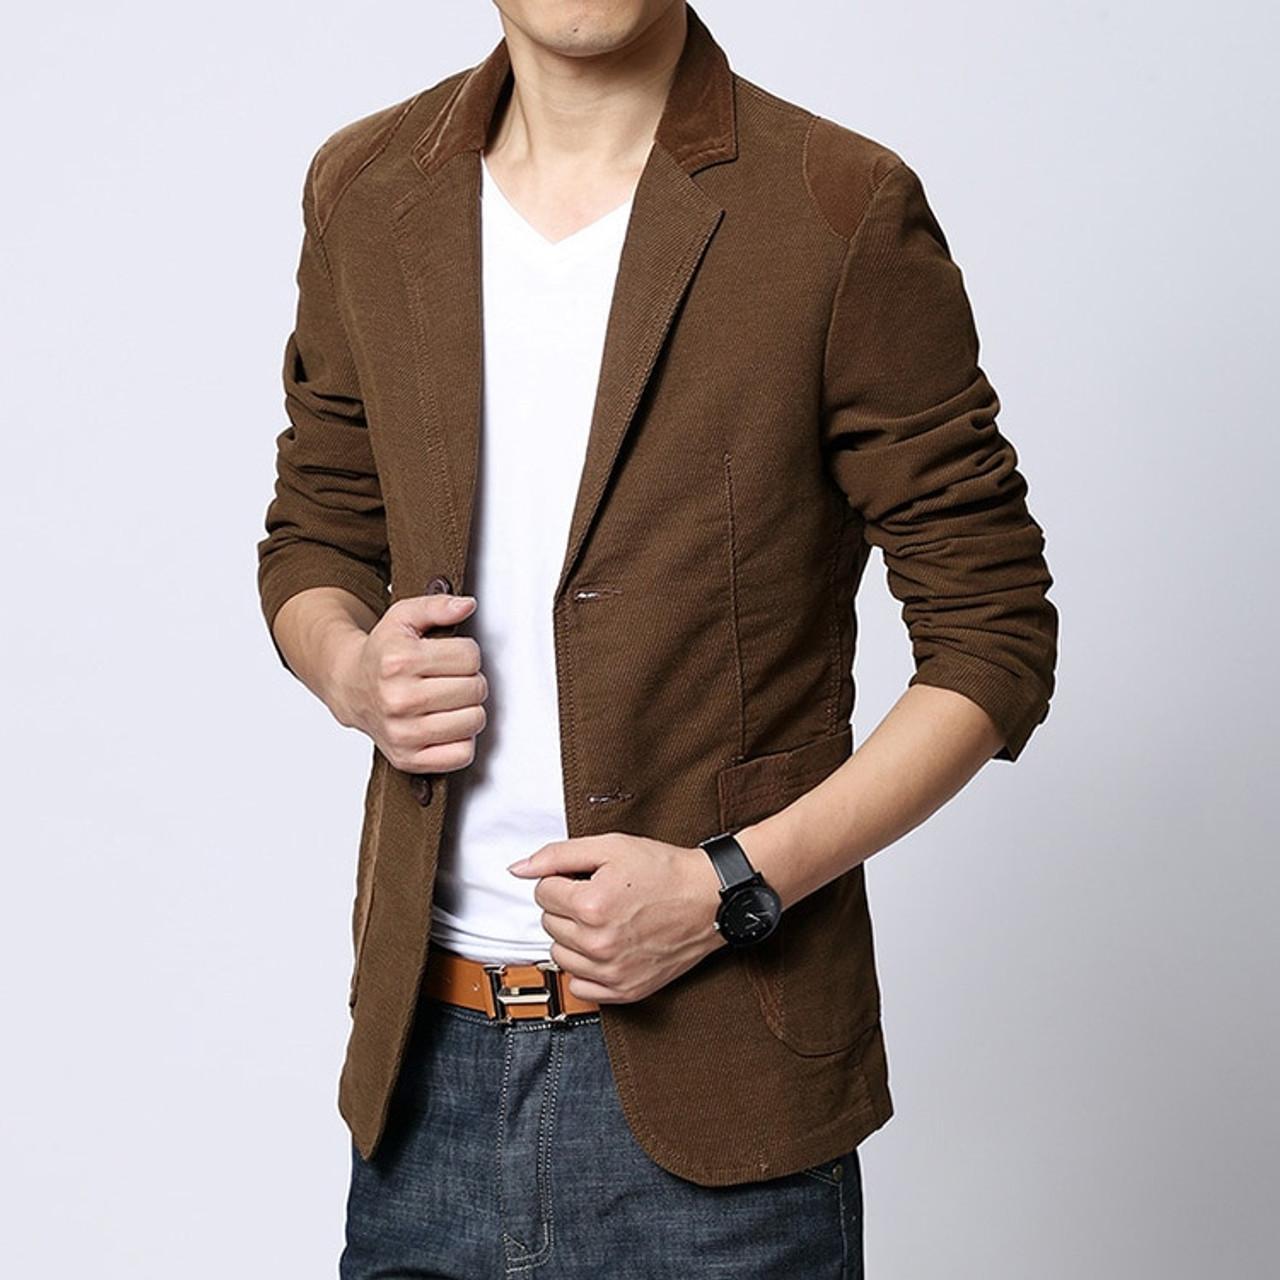 cf7a2bbf6d0 ... Mens blazer Casual khaki Slim Fit Plus Size 4XL 5XL 6XL Suits Jacket  Blazer Men 3 ...